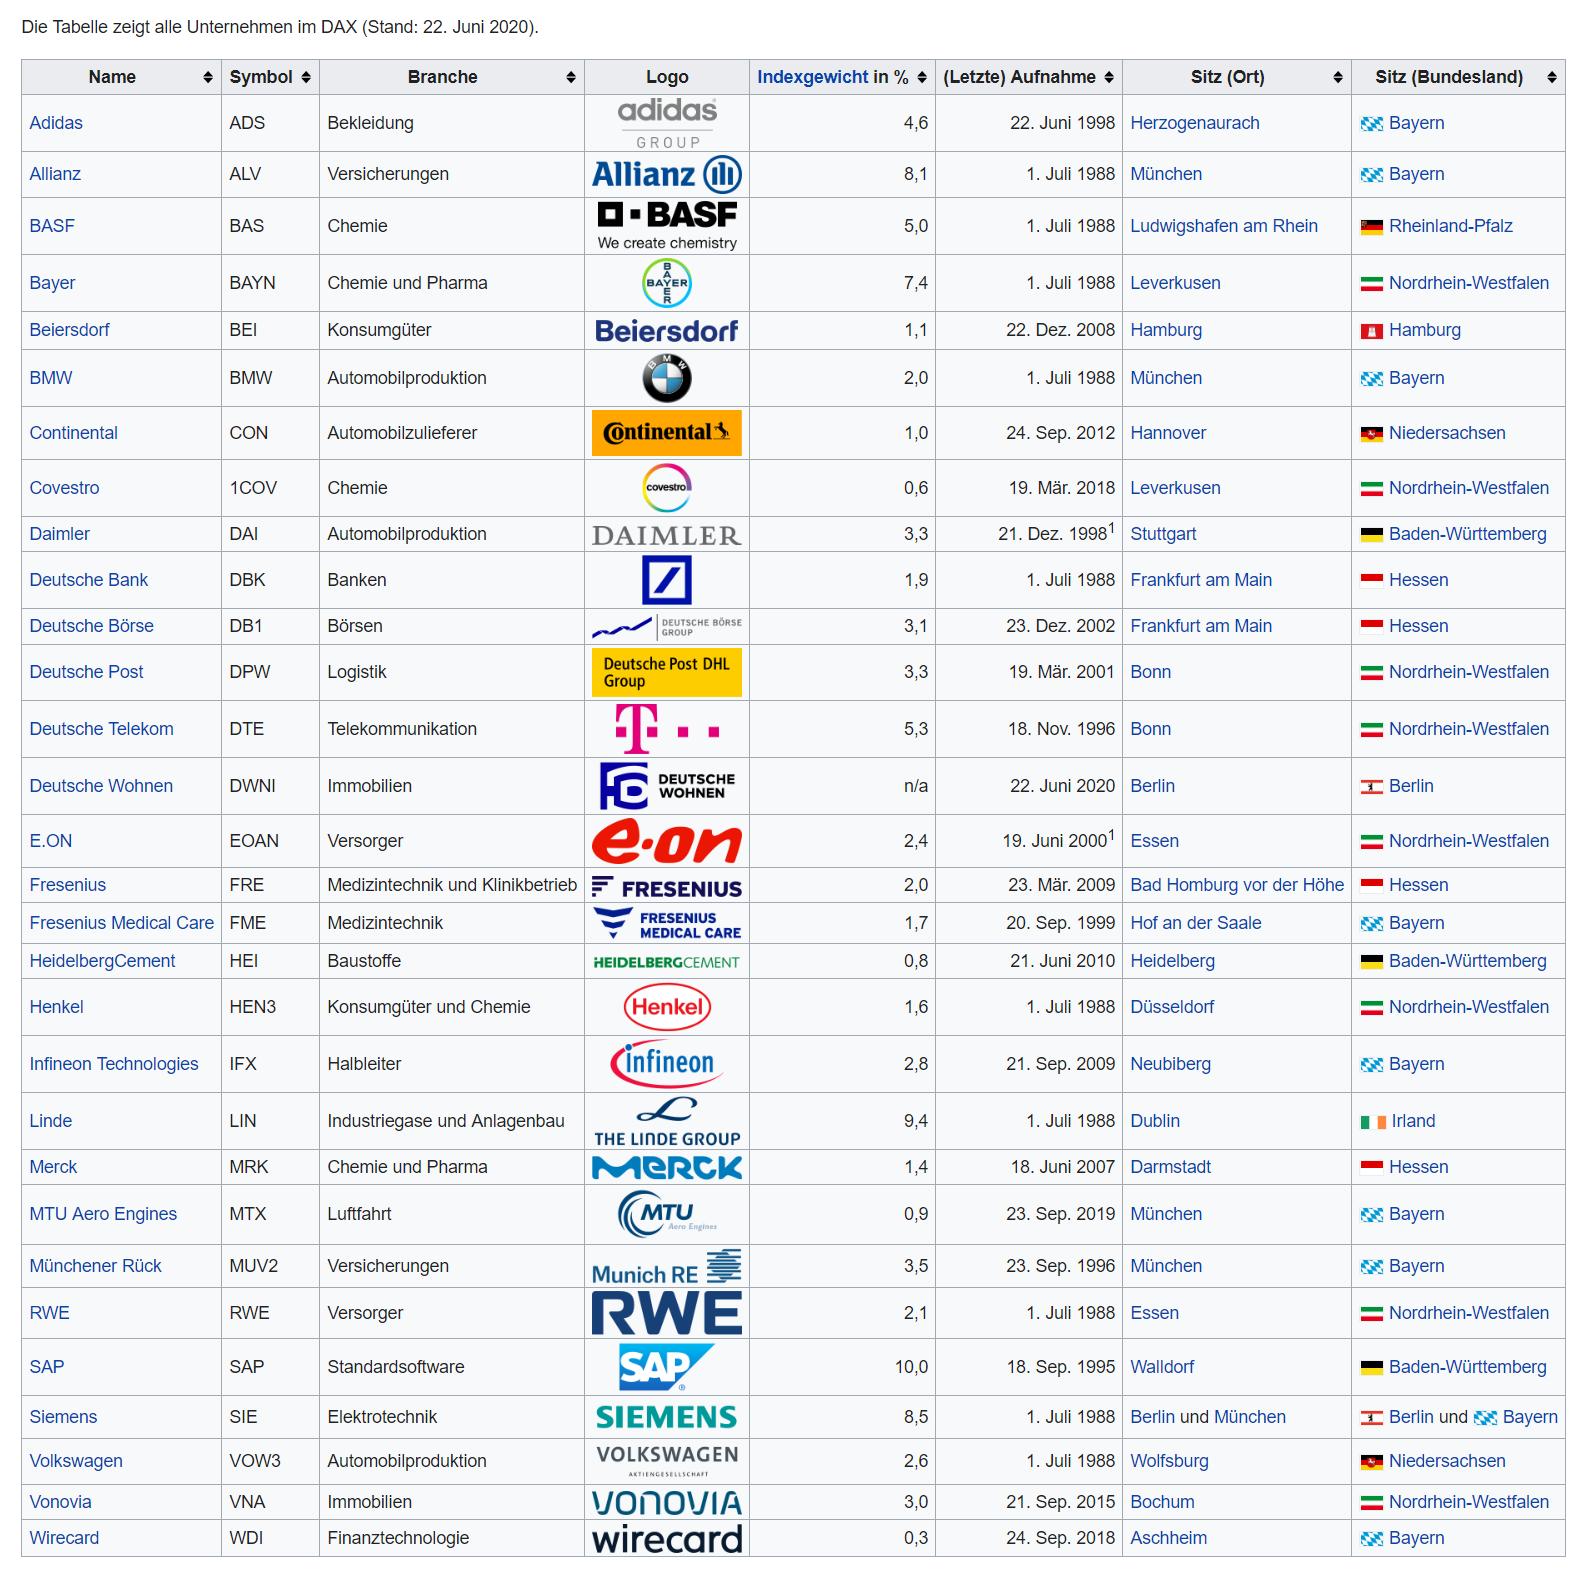 zloženie DAX30 k júnu 2020, zdroj: Wikipedia